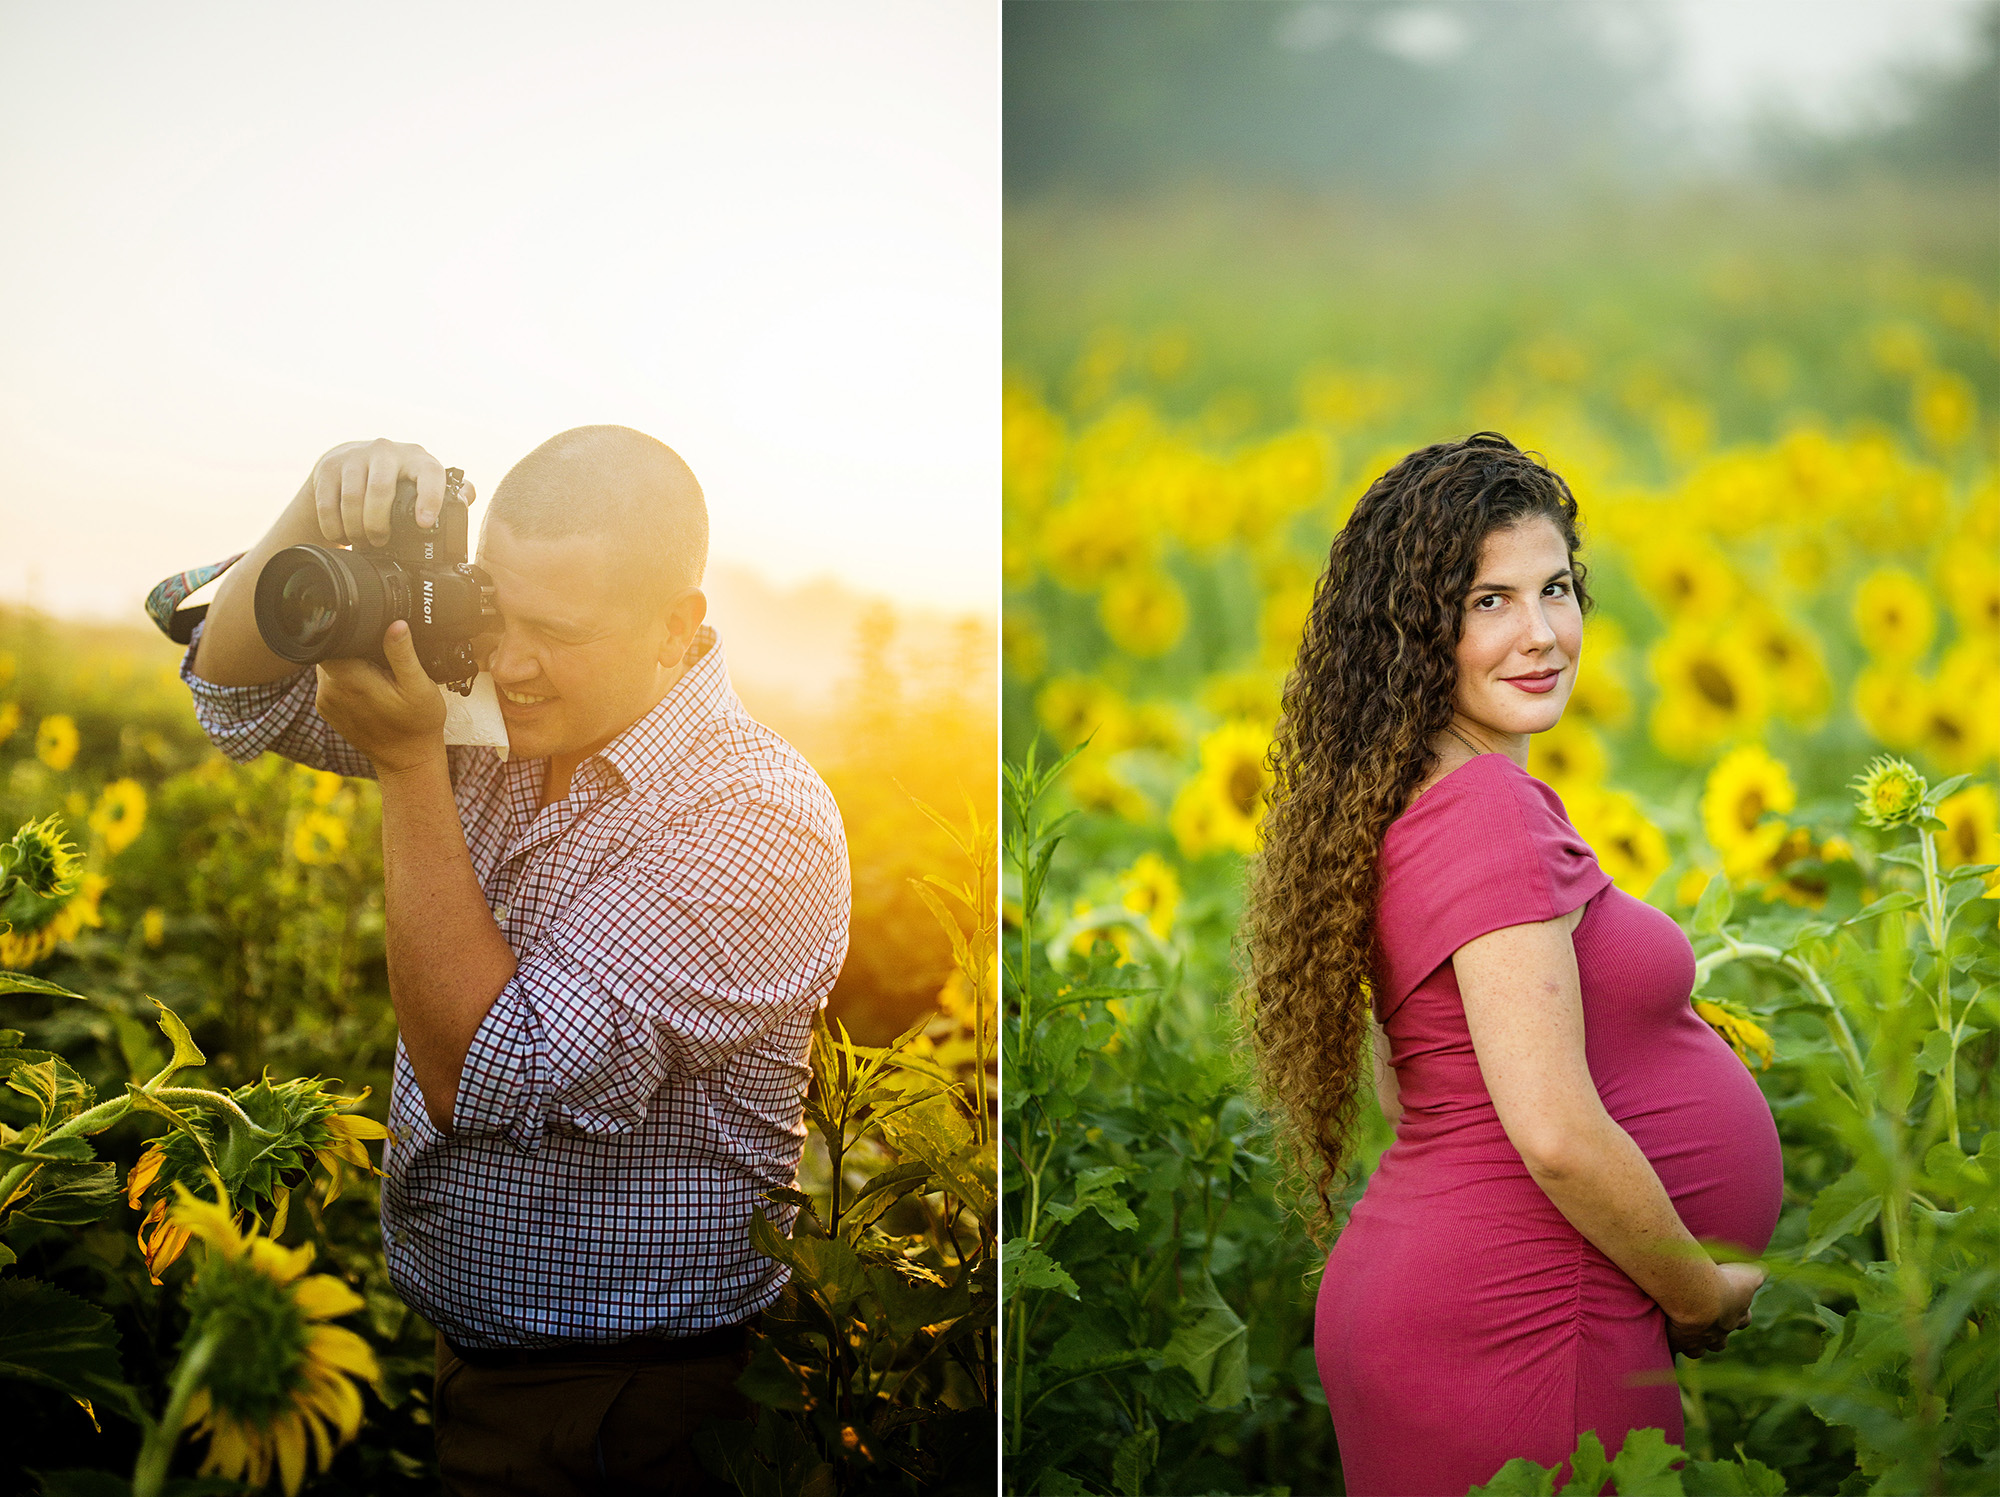 Seriously_Sabrina_Photography_Lexington_Frankfort_Kentucky_Maternity_Mini_Sunflowers_Johns8.jpg